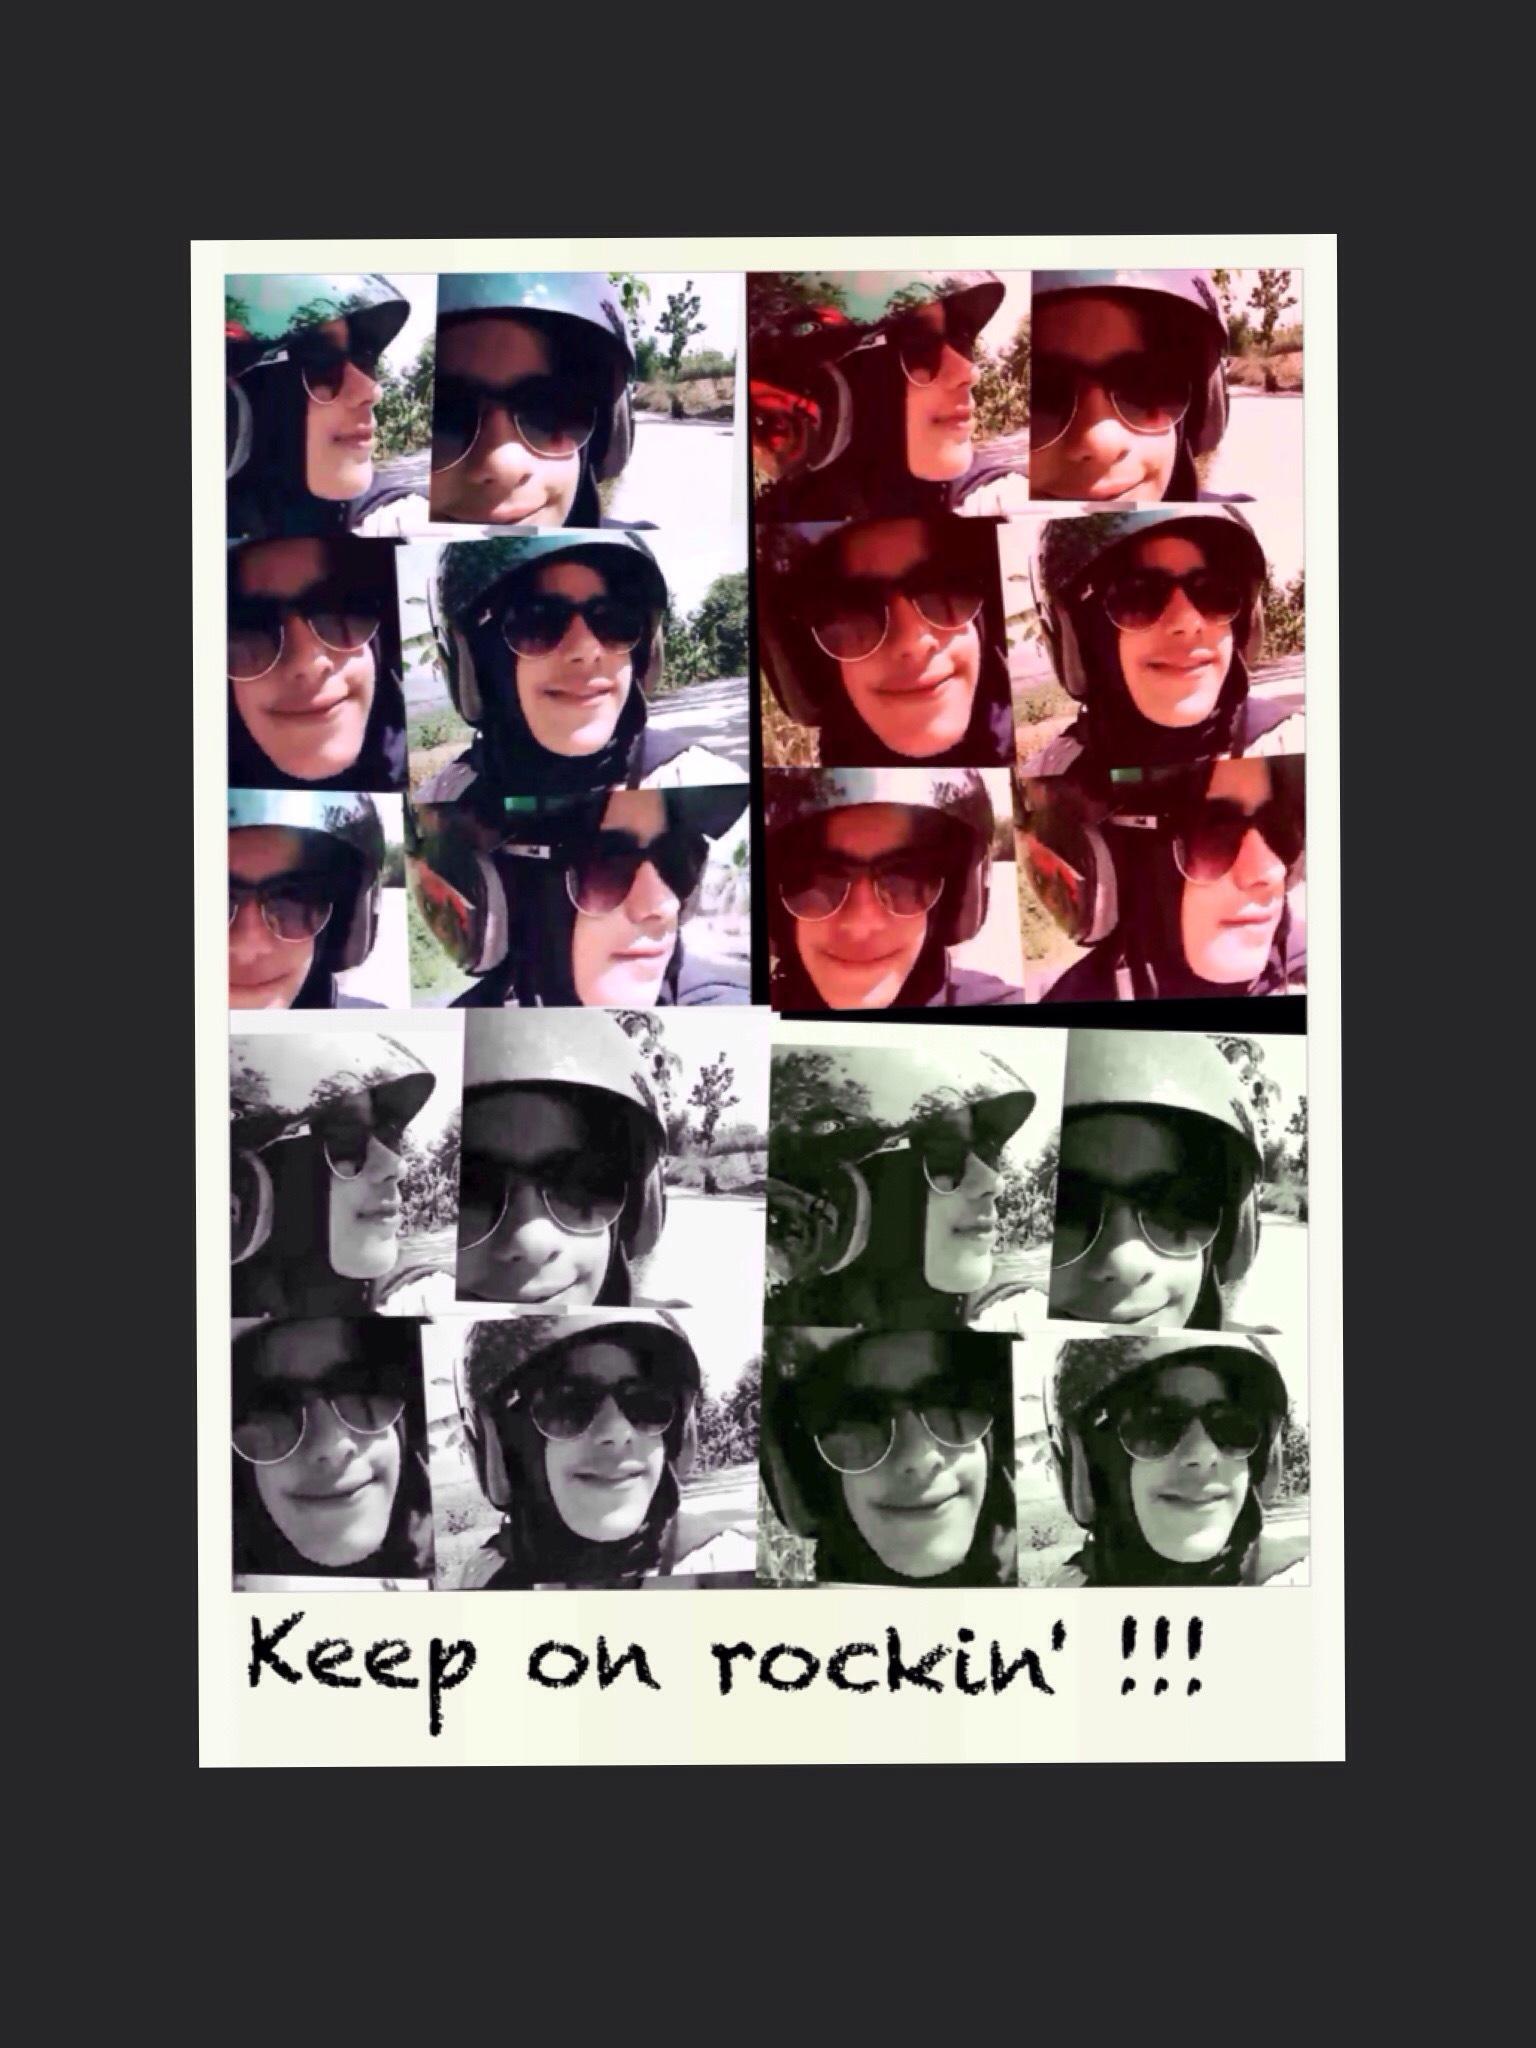 Keep on rocking !!! by vivie13450